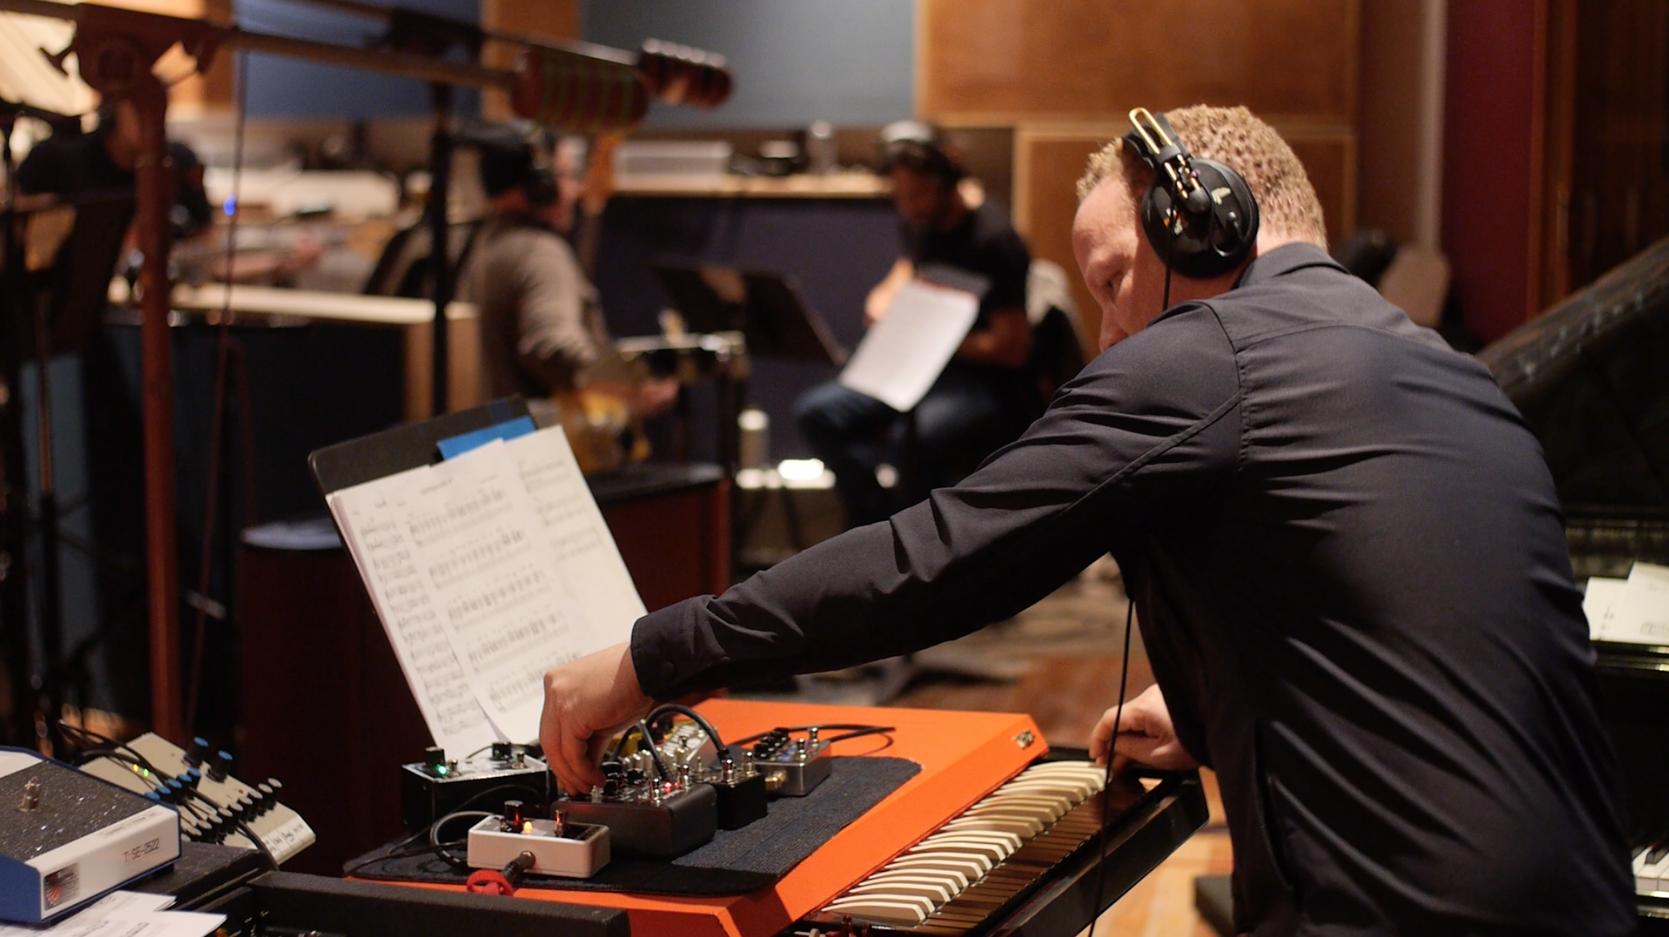 Craig Taborn, SuperBigmouth recording session, Brooklyn, NY November 2017. photo credit: Bradley Rosen